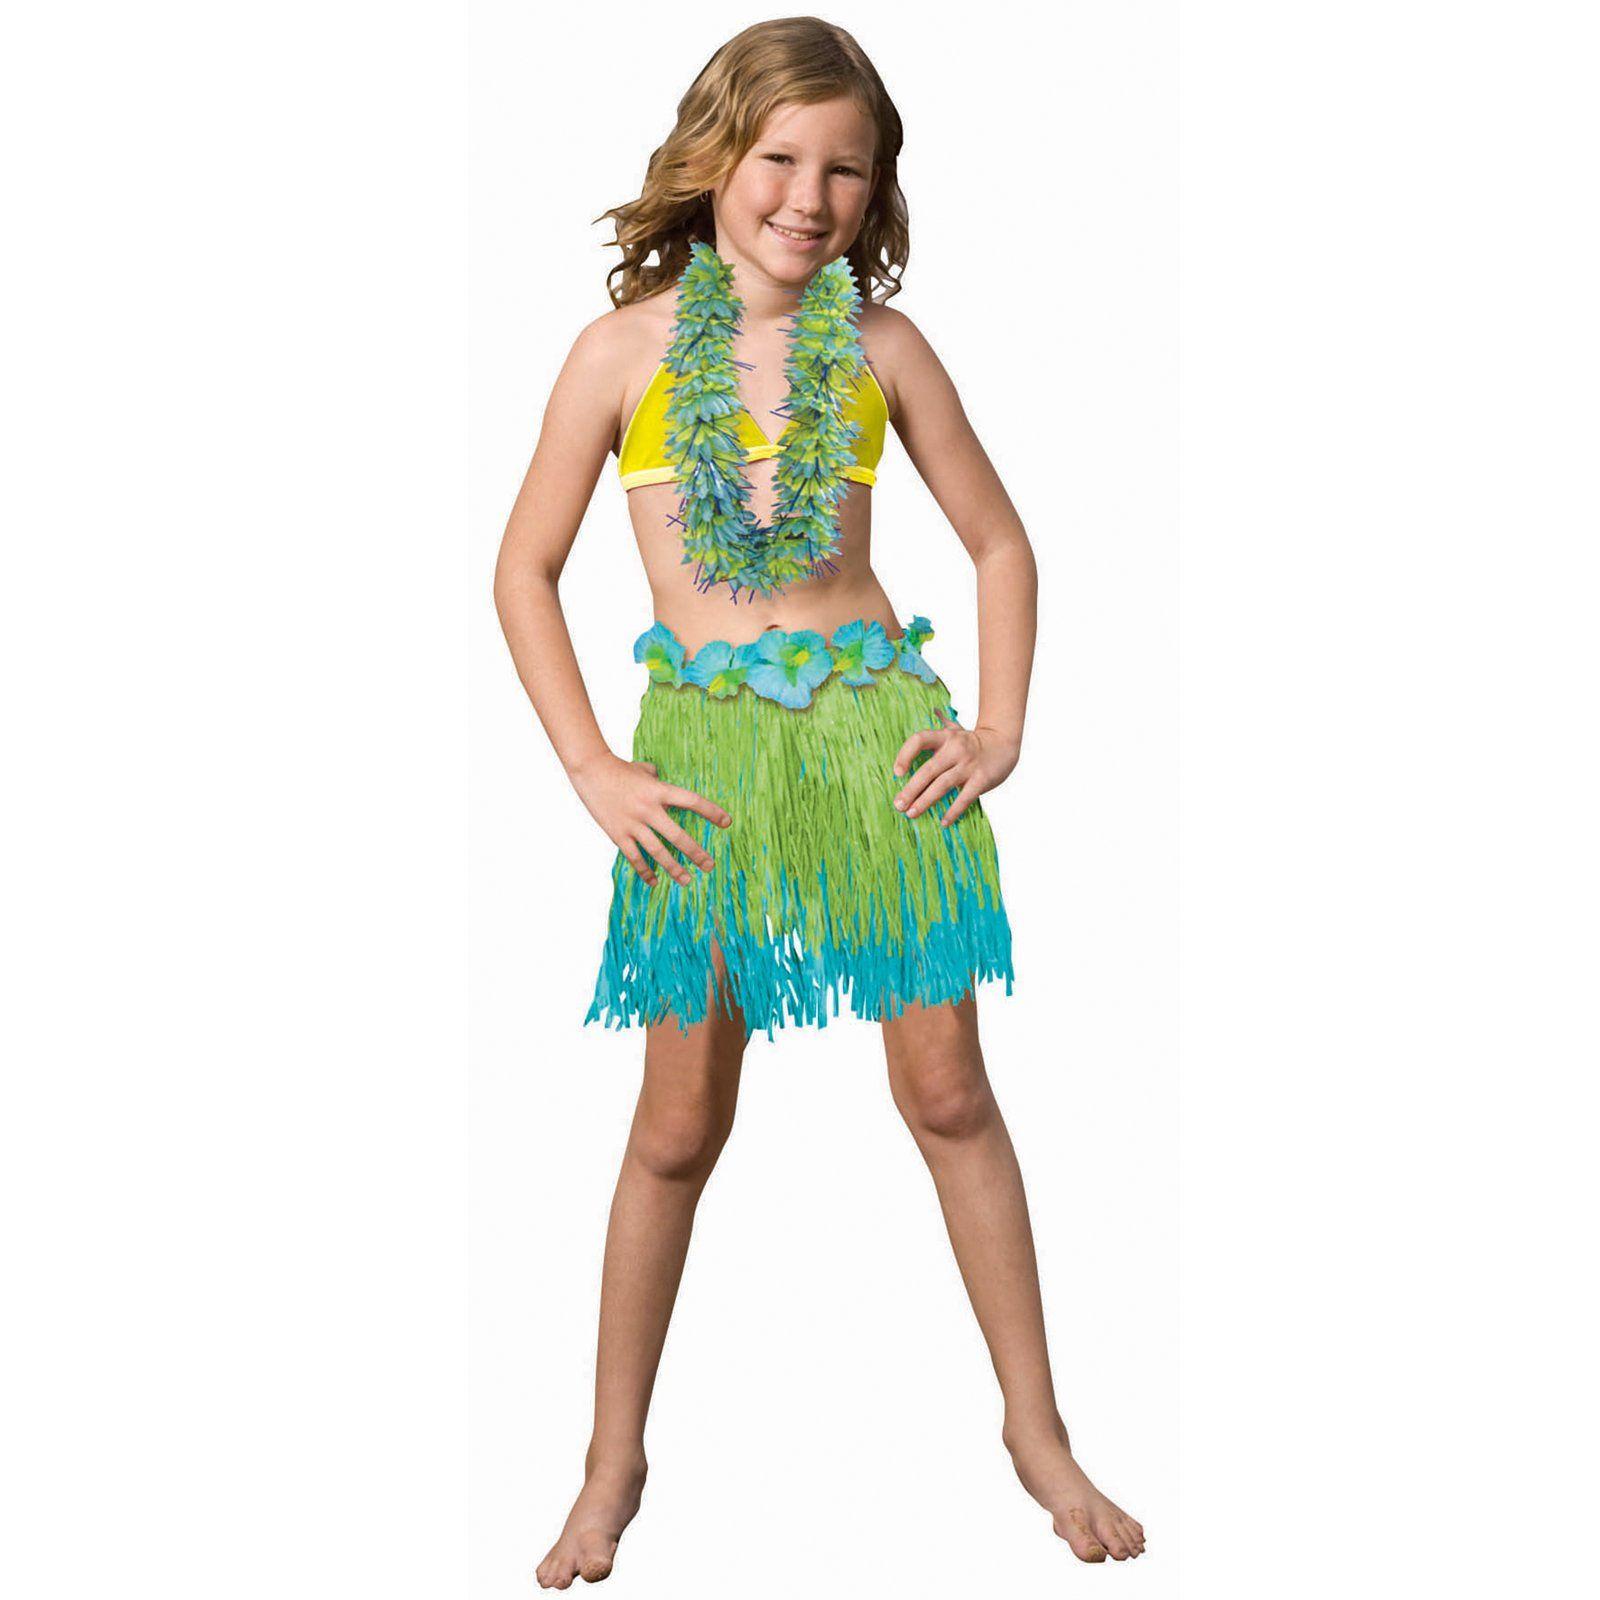 Child Two Tone Blue / Green Grass Skirt, 78584